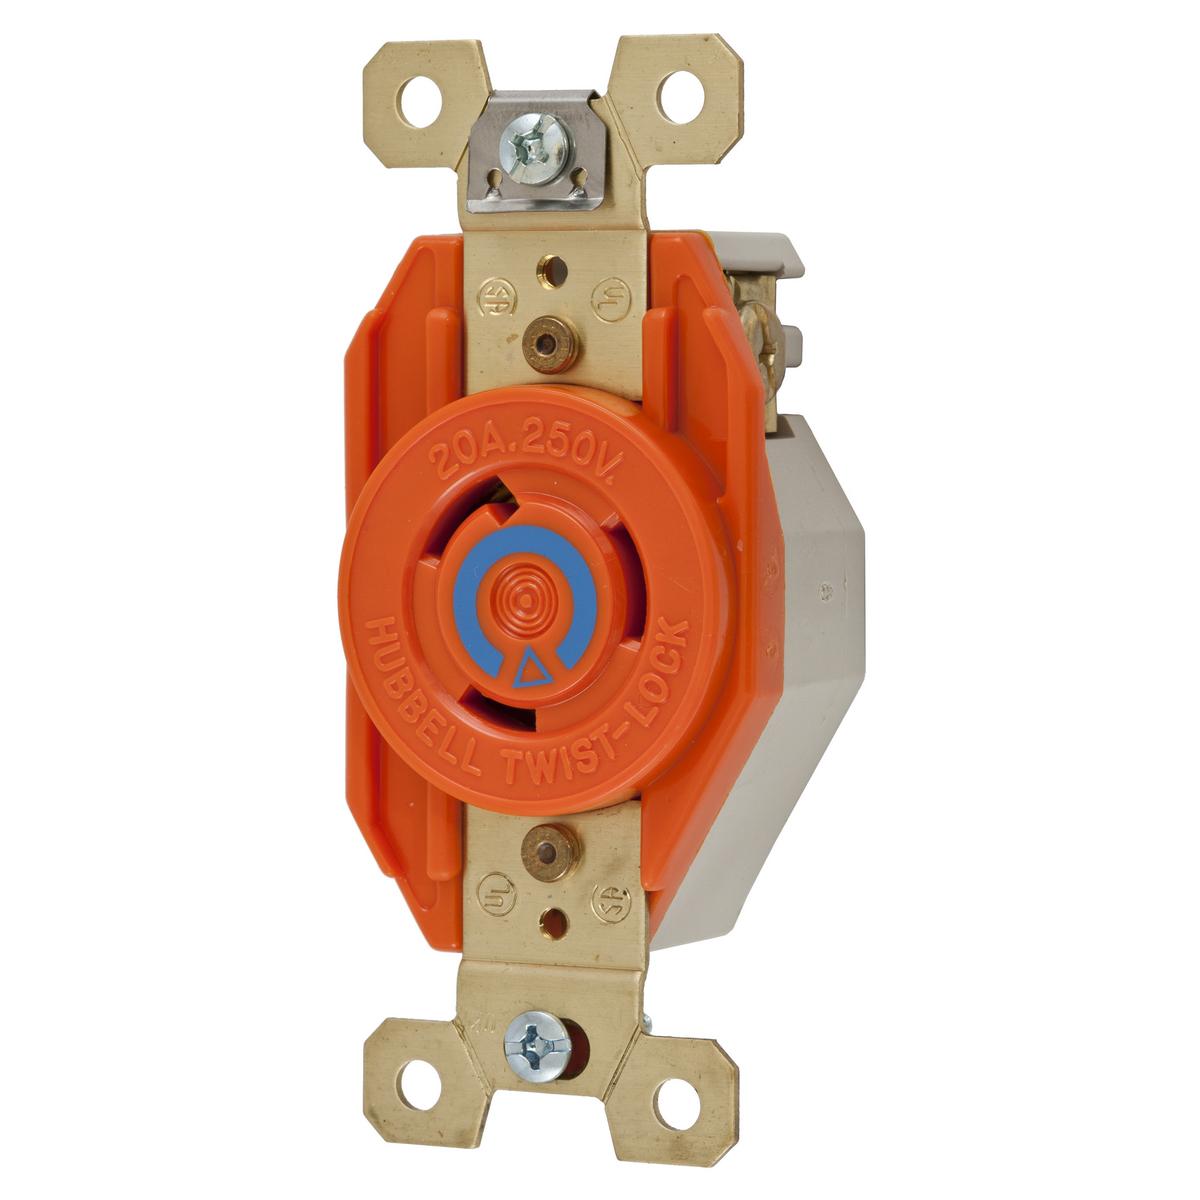 Hubbell IG2320 20 Amp 250 Volt 2-Pole 3-Wire NEMA L6-20R Orange Isolated Ground Locking Single Receptacle